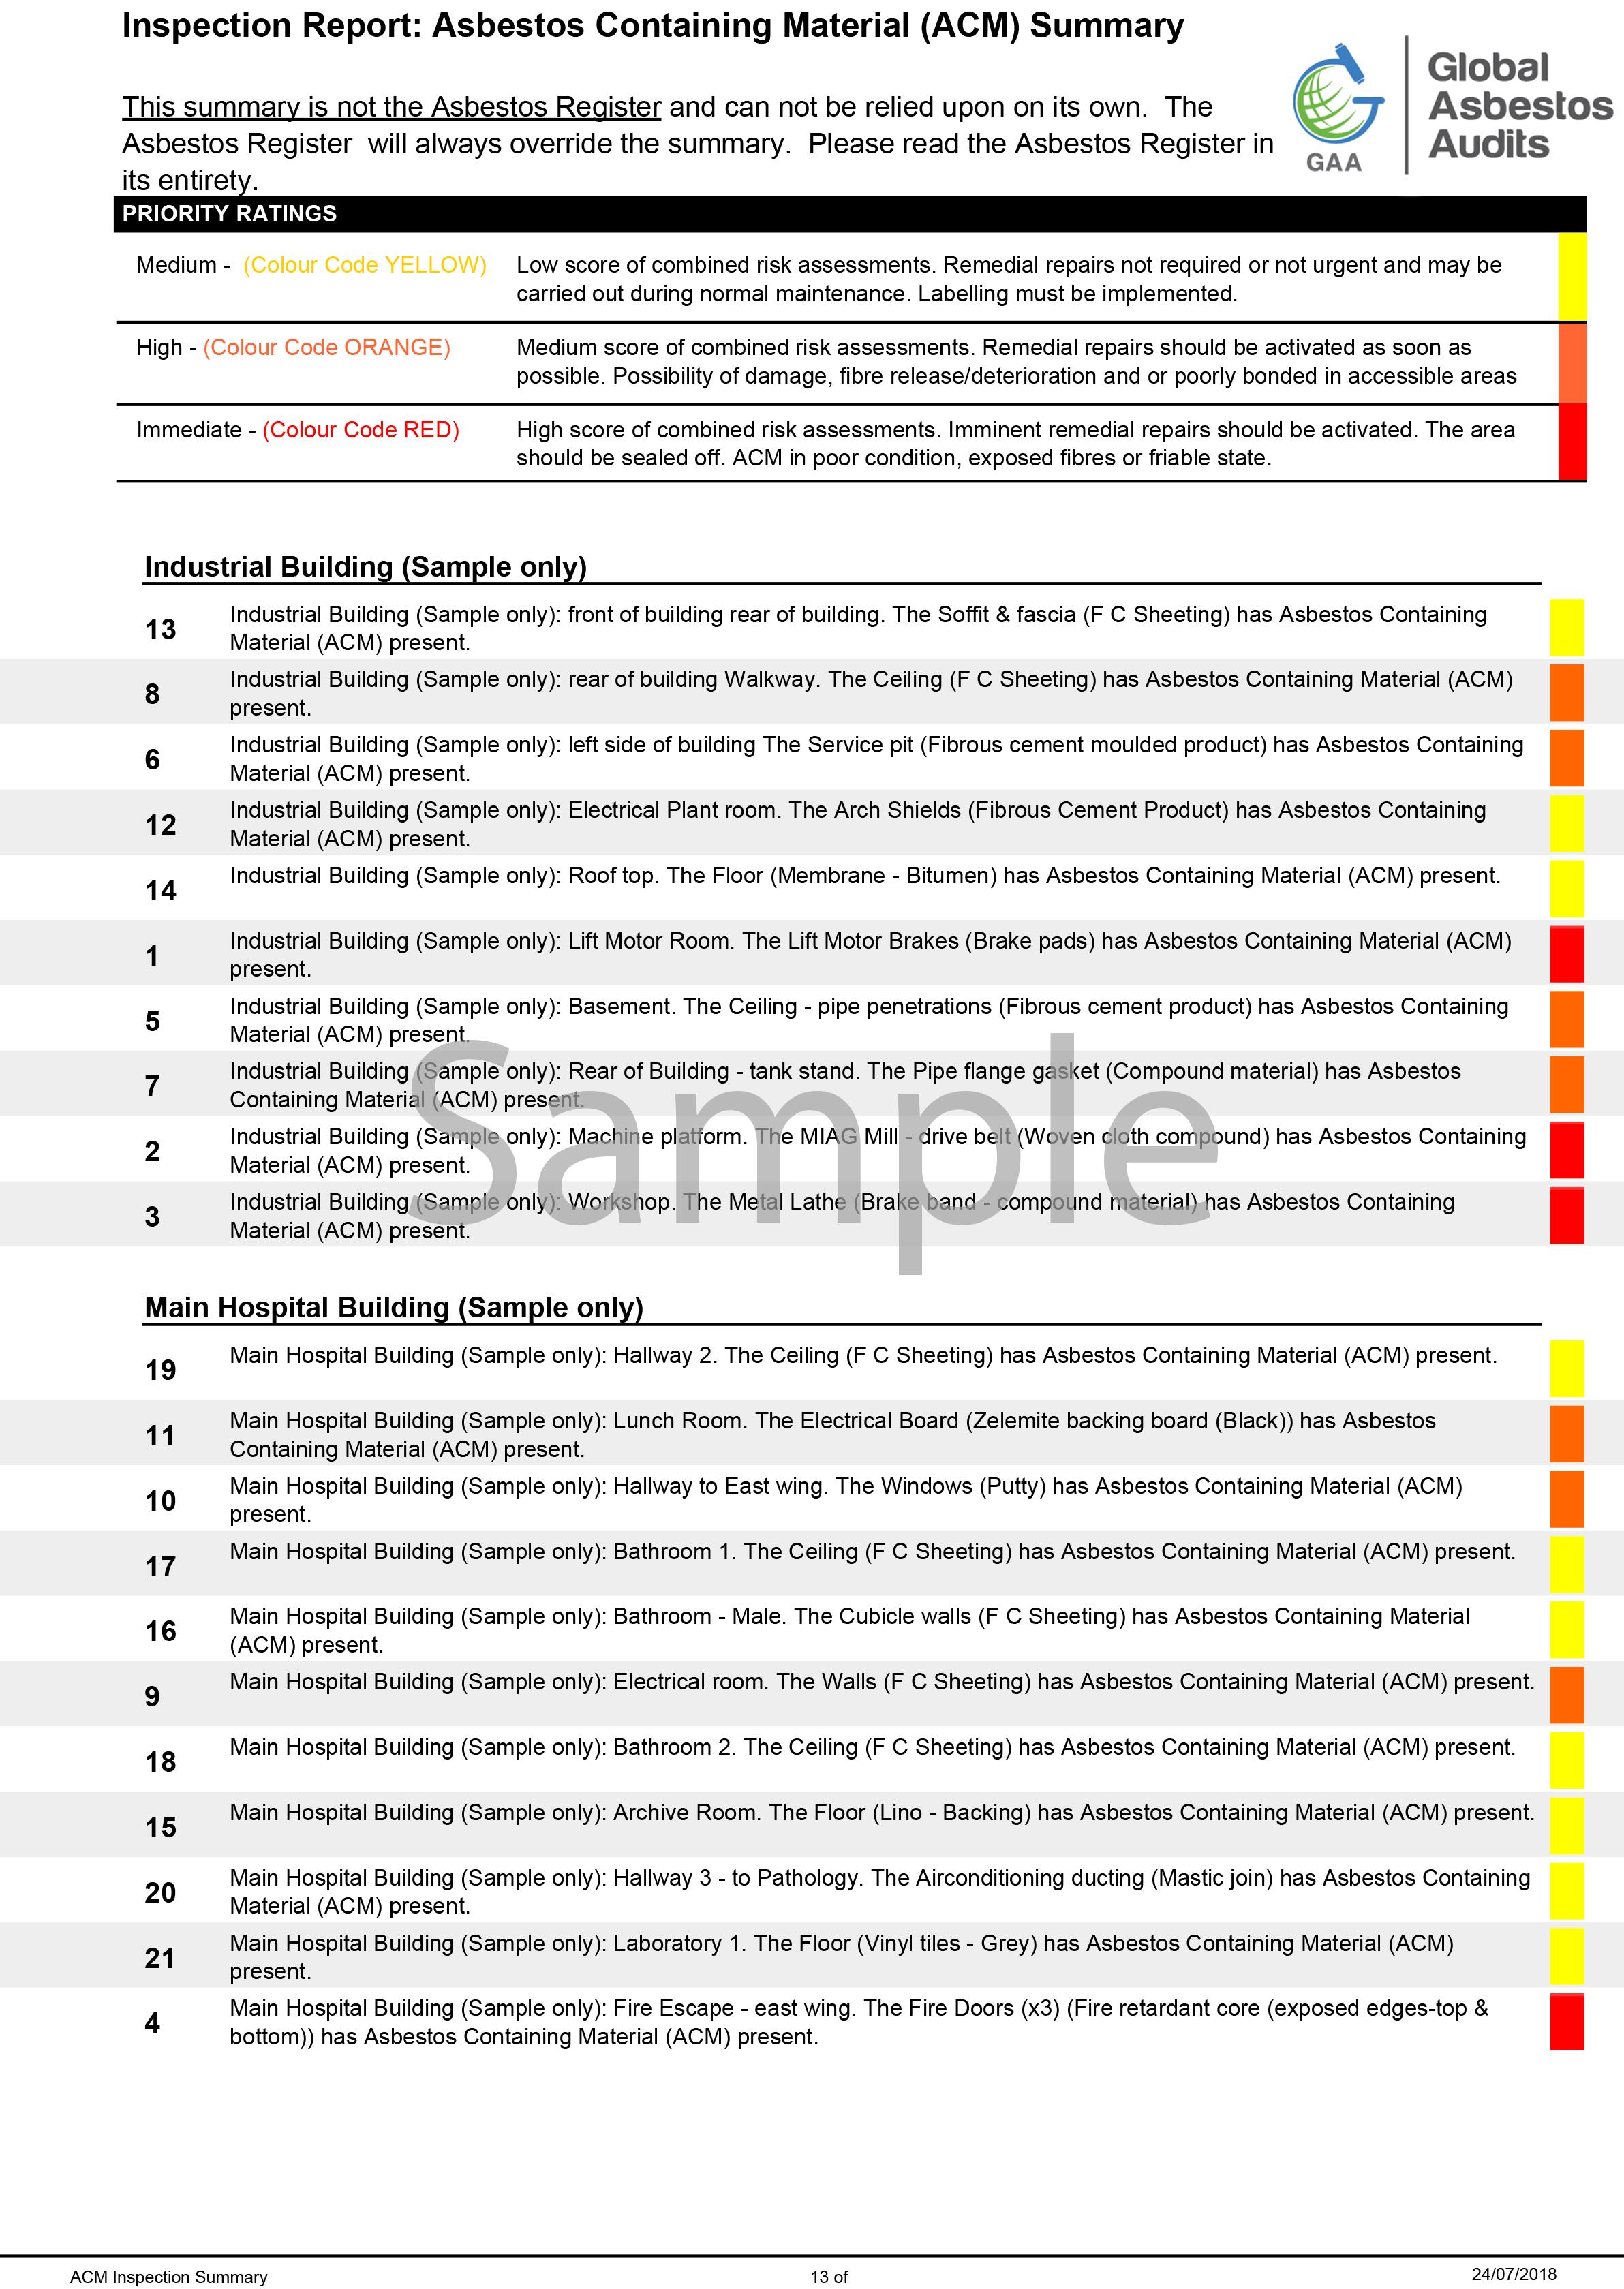 Appendix 5 ACM Colour Coded Summary.png